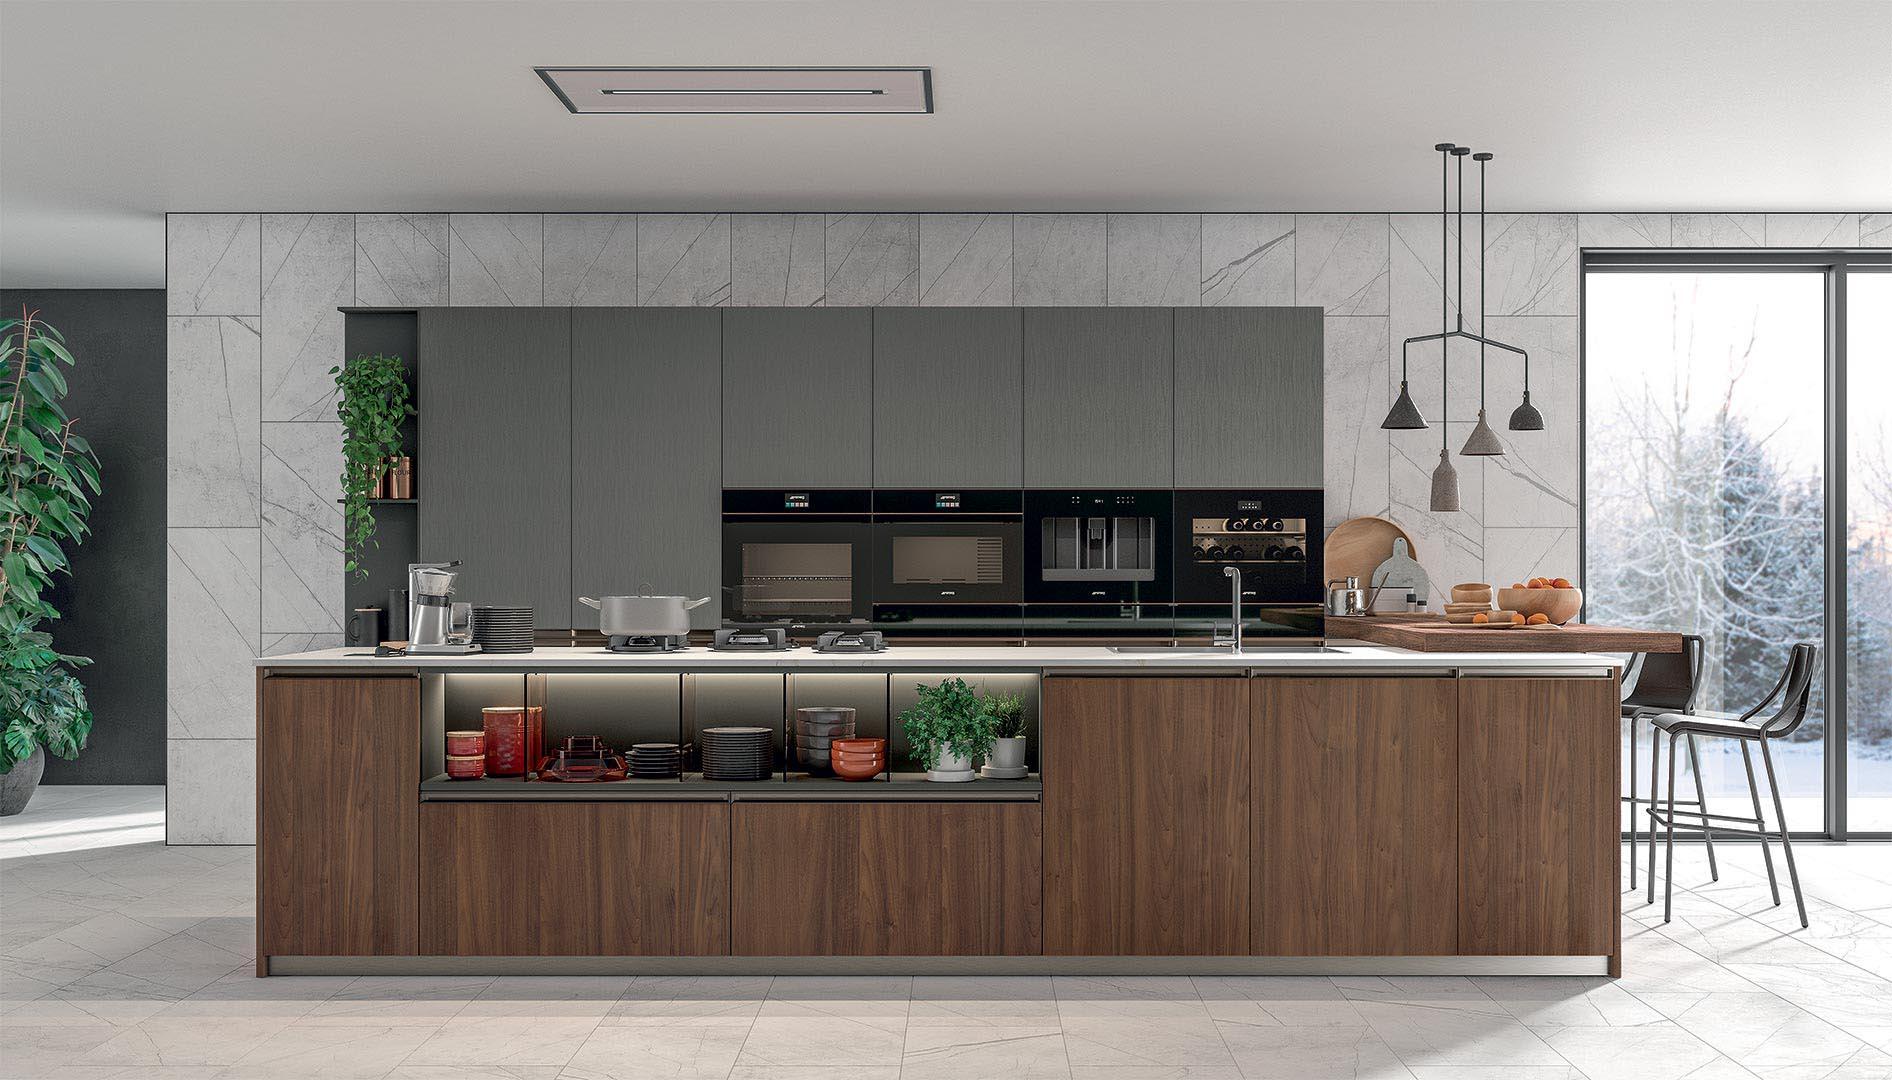 Cucina Lube Immagina Plus - Vissani Casa